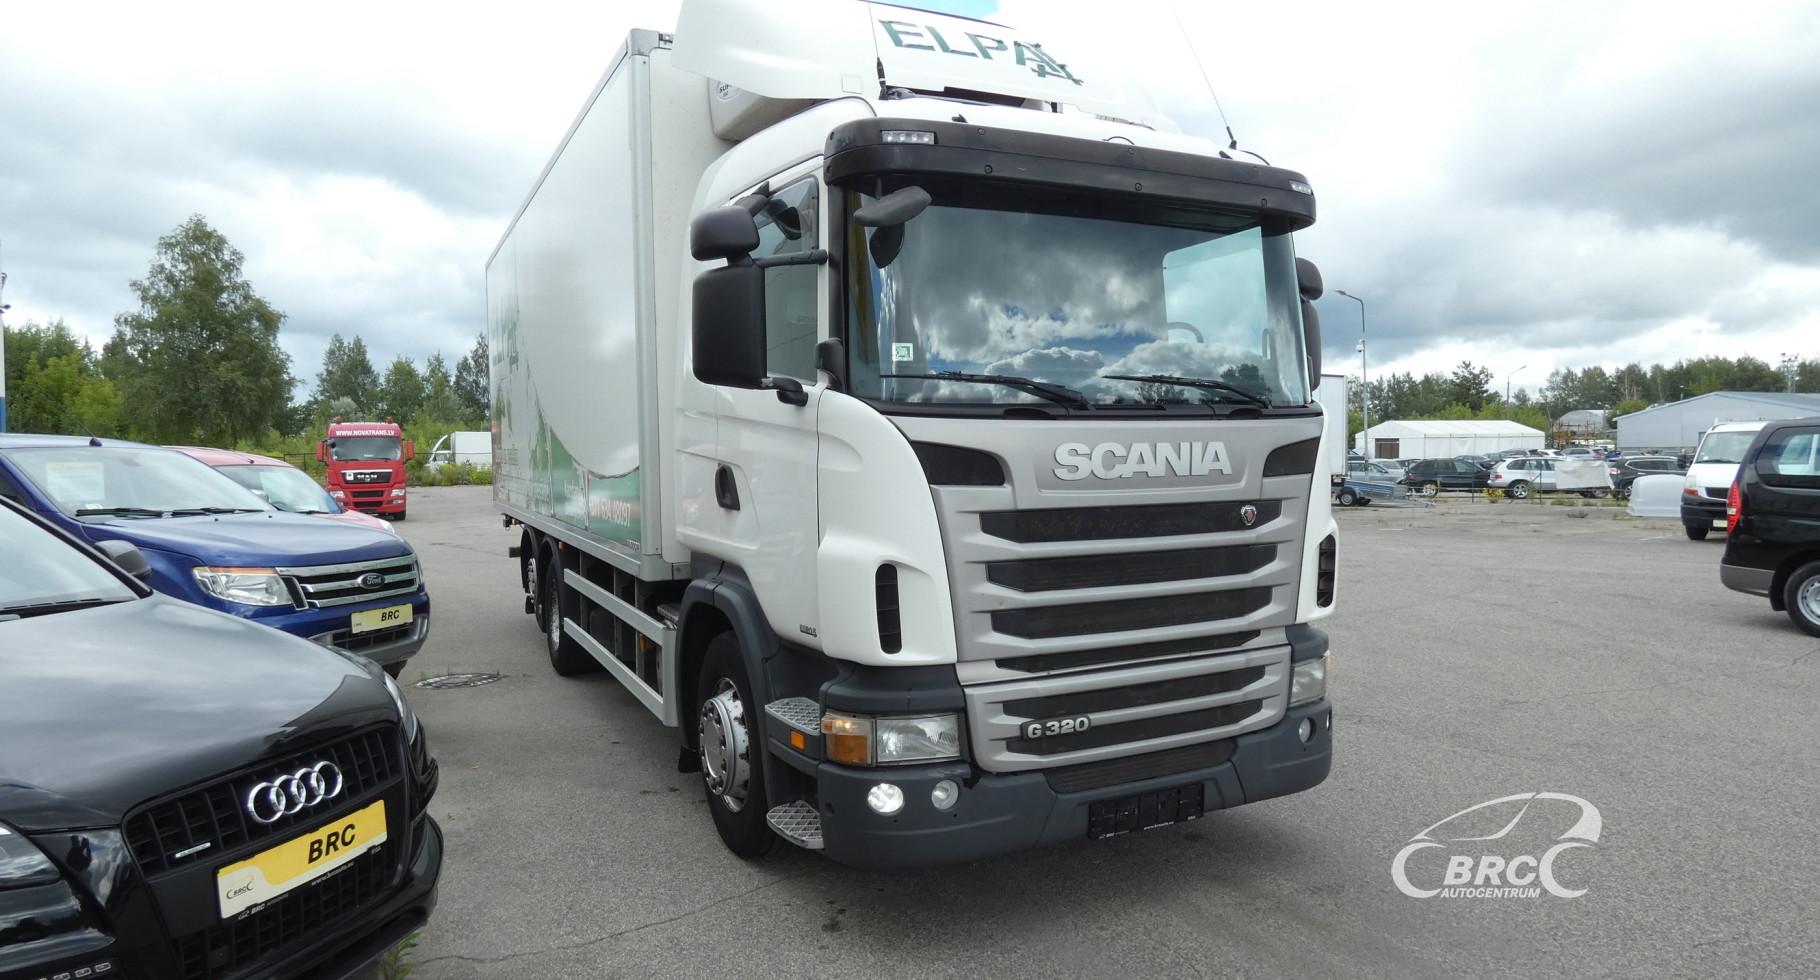 Scania G 320 REF